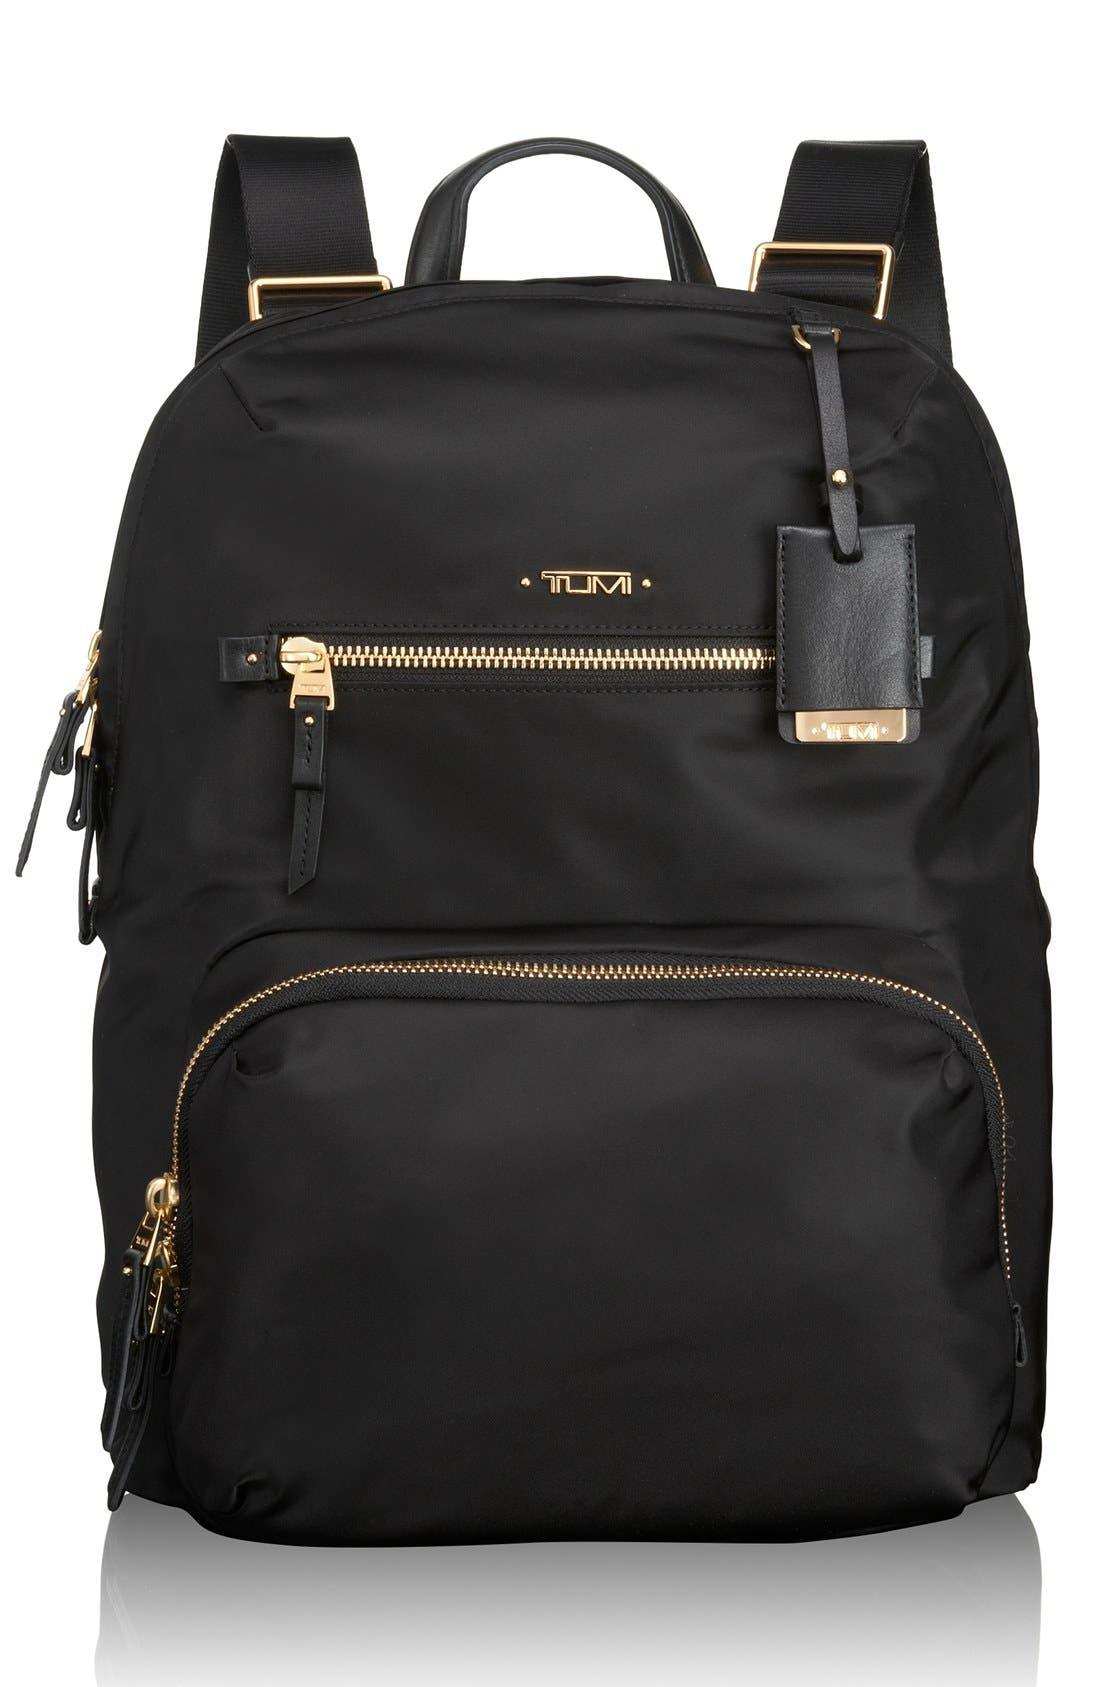 Main Image - Tumi 'Voyageur Halle' Nylon Backpack